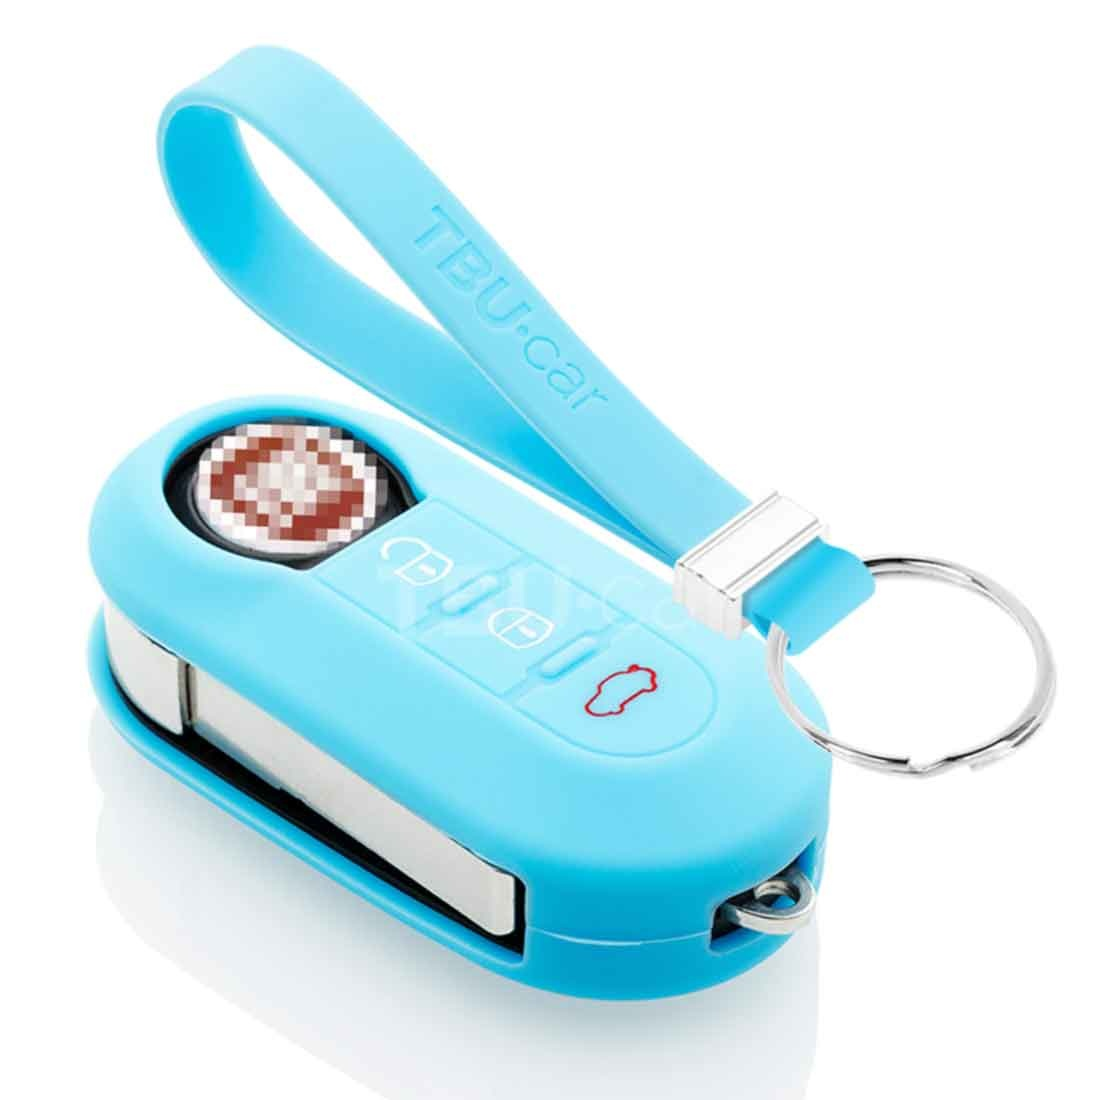 TBU car TBU car Sleutel cover compatibel met Lancia - Silicone sleutelhoesje - beschermhoesje autosleutel - Lichtblauw